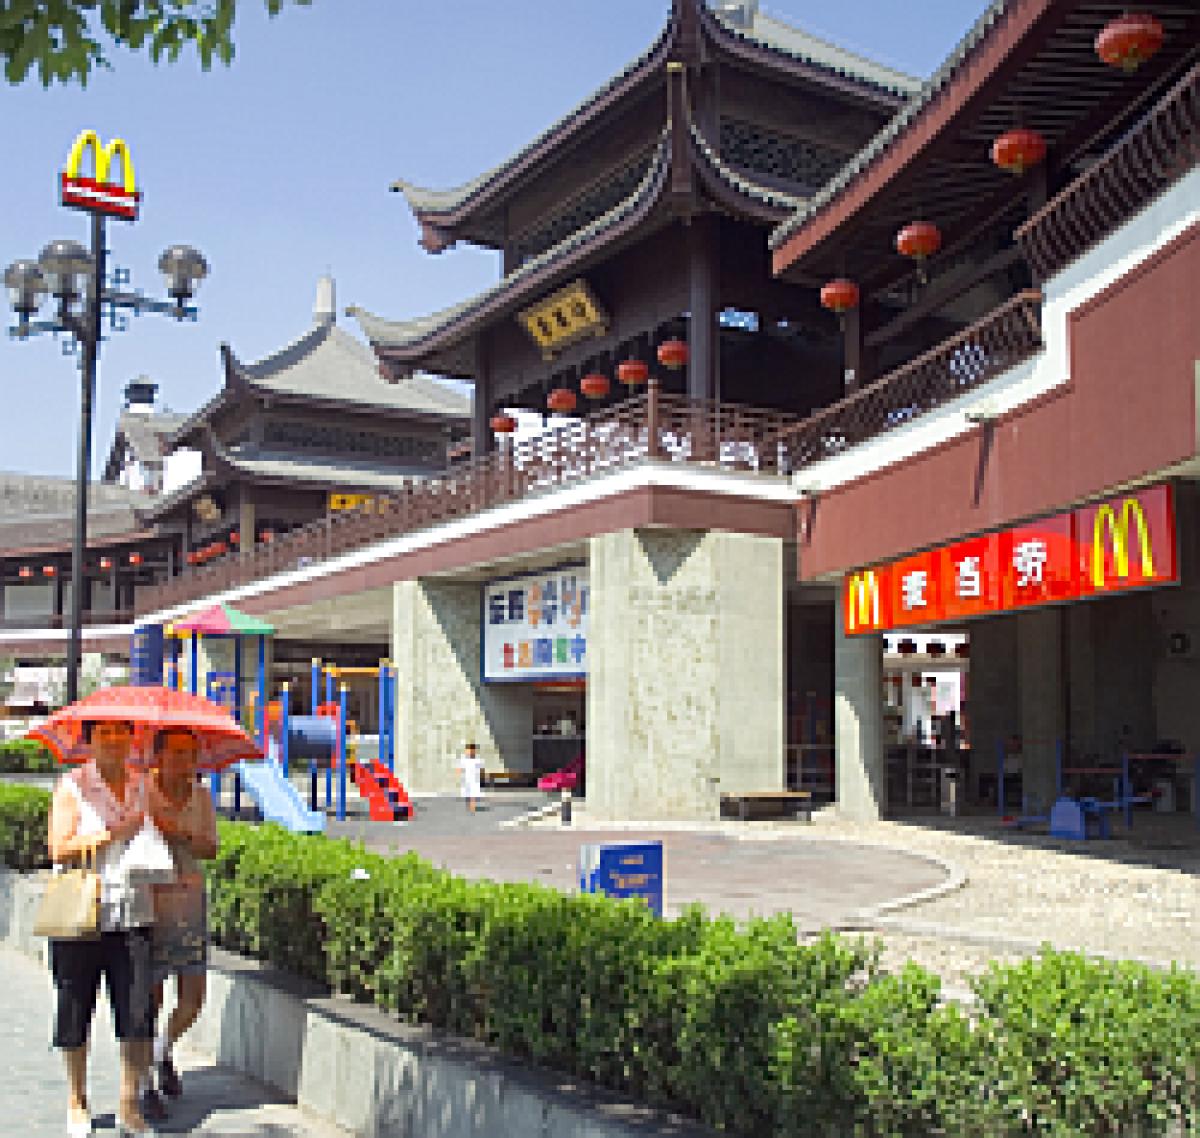 McDonald's Shanghai